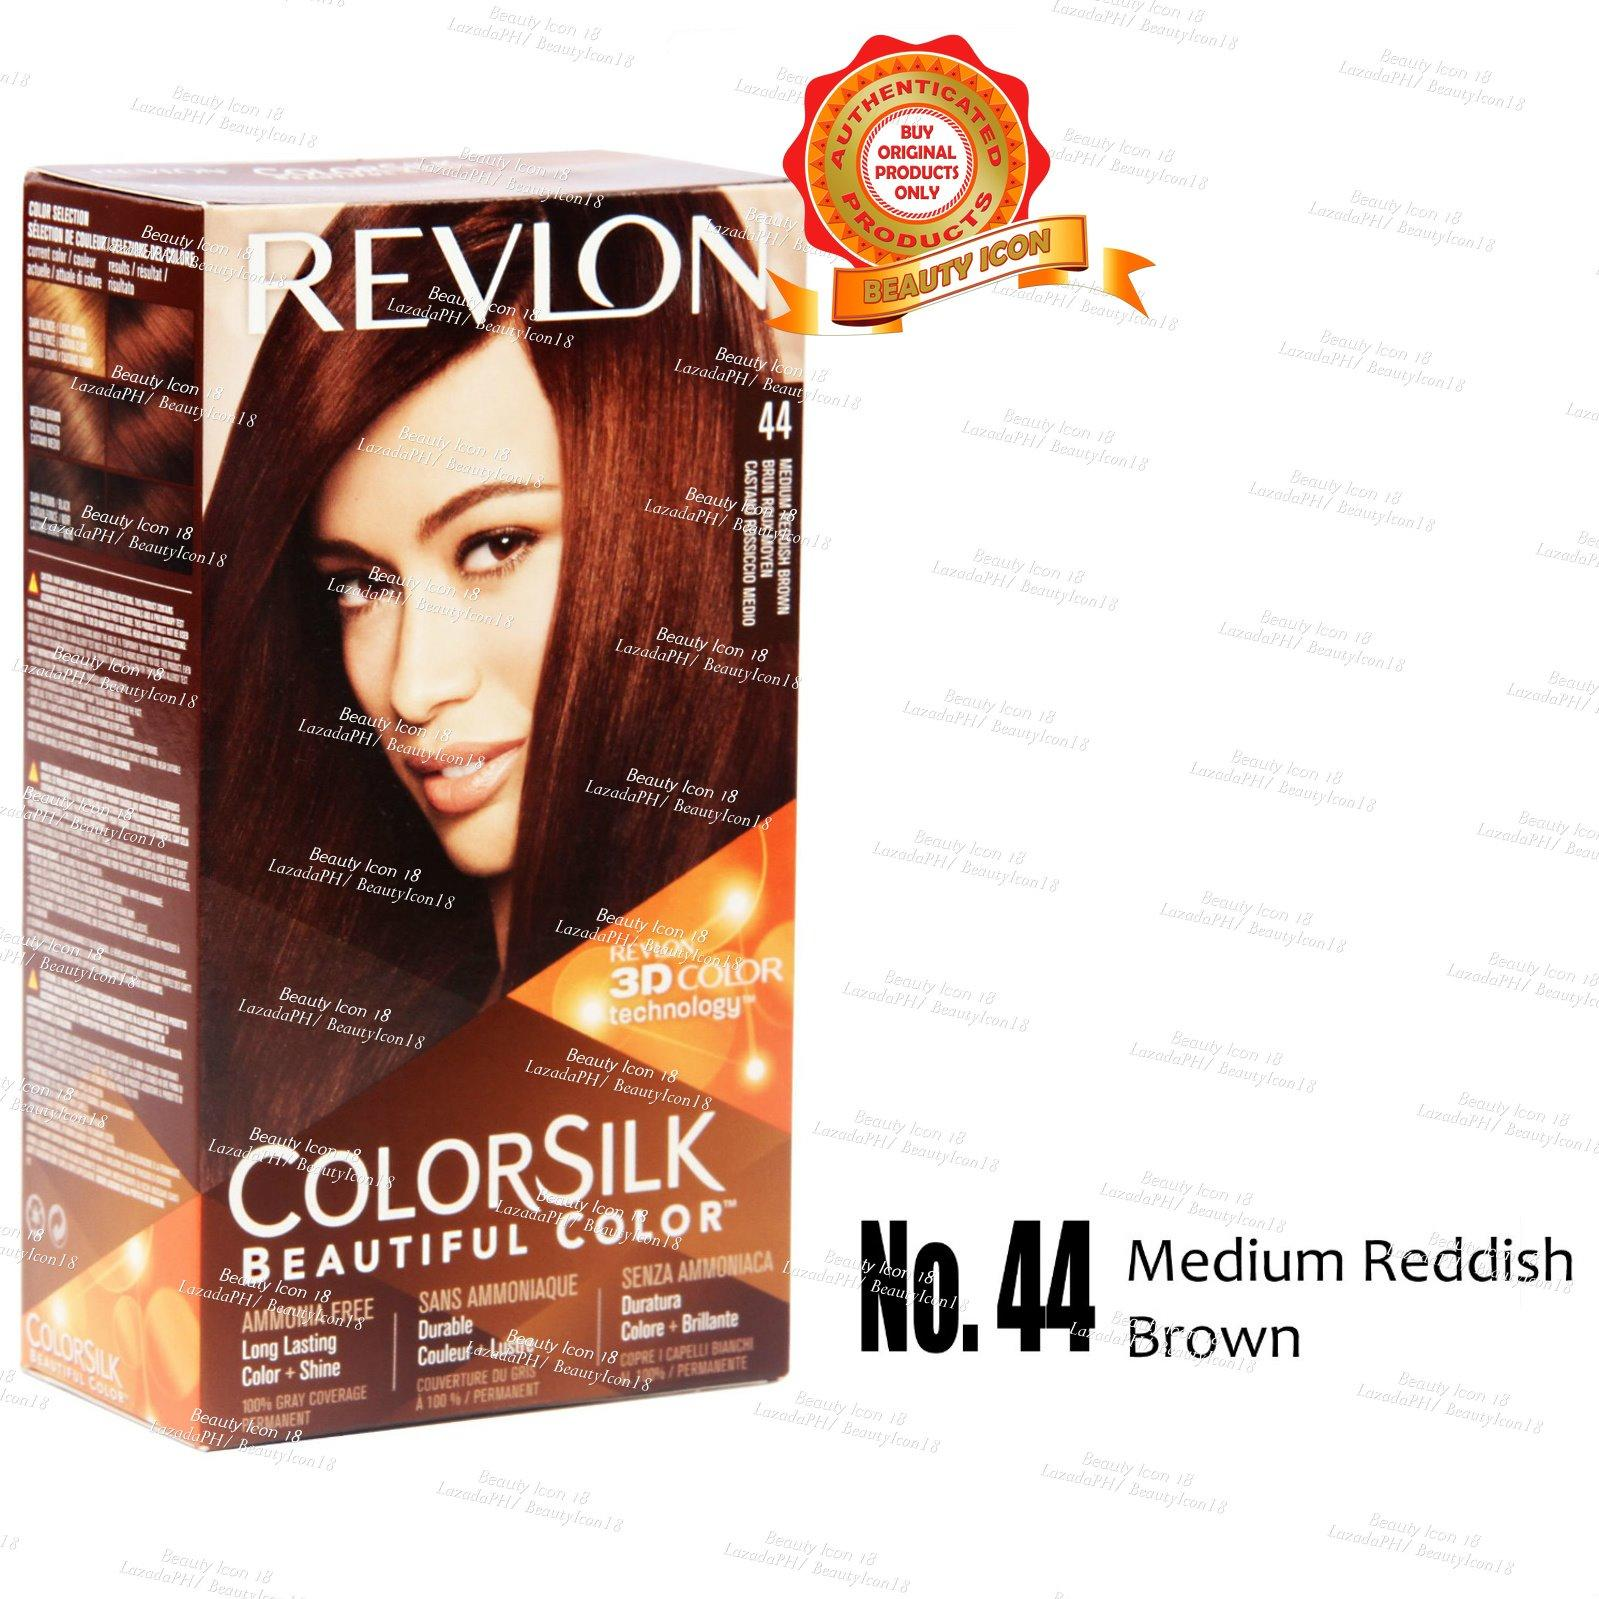 Revlon Color Silk Beautiful Ammonia Free No 44 Medium Reddish Brown